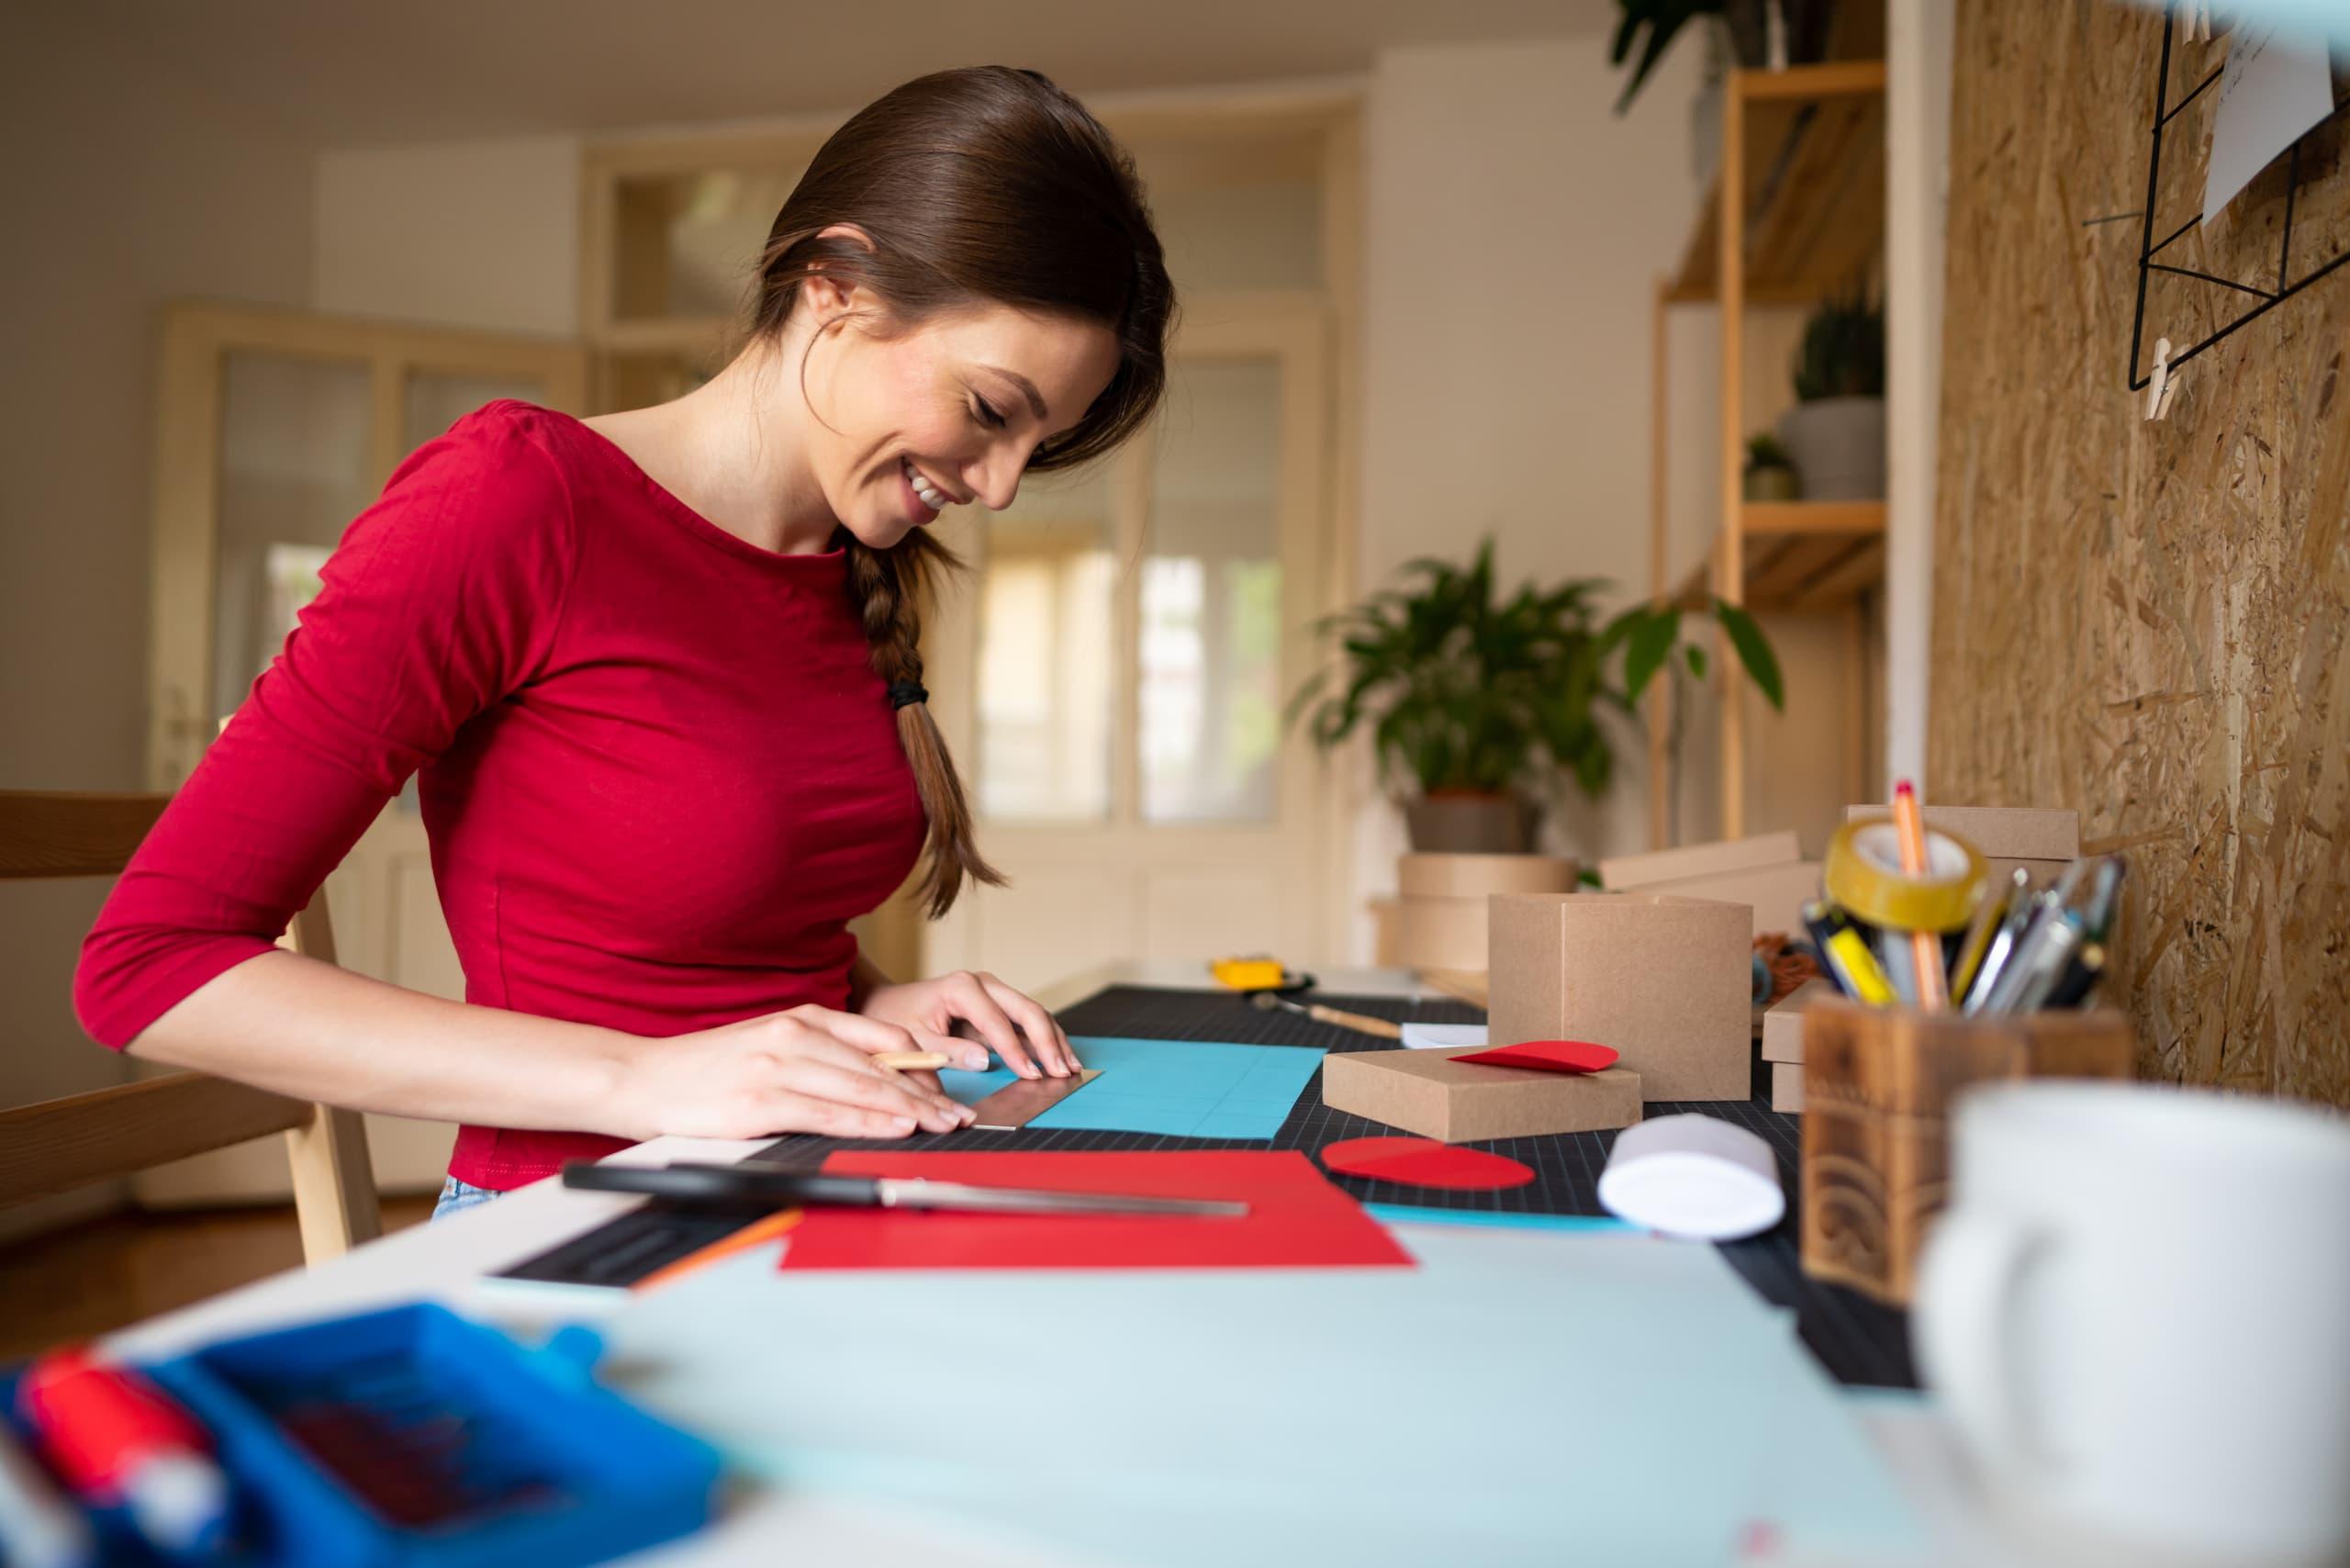 Woman happily making a DIY desk organizer